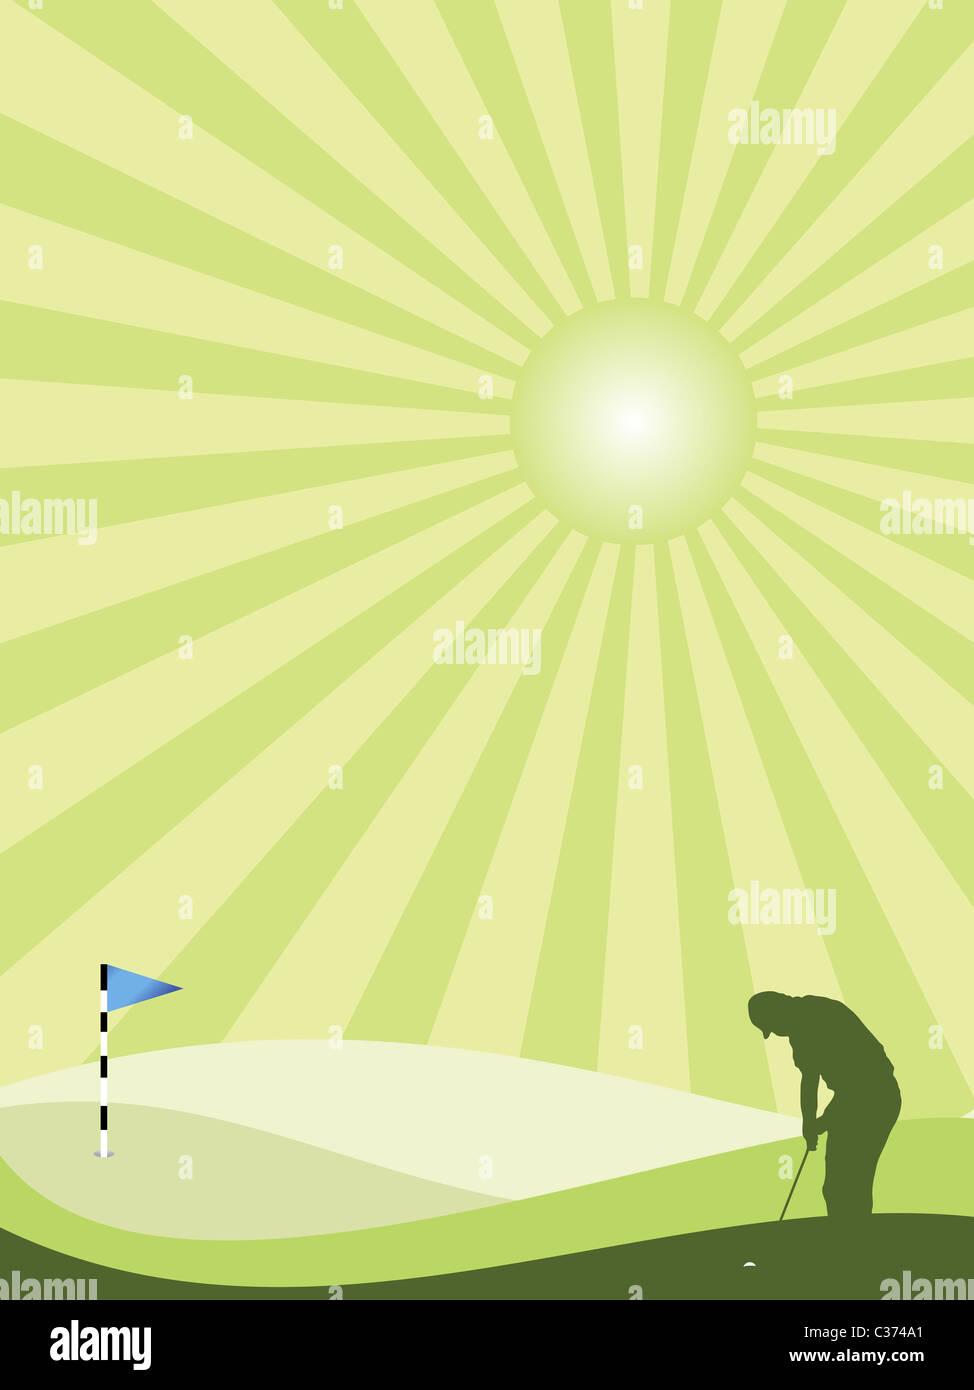 Golfista silueta en verde campiña con sunburst sky Imagen De Stock